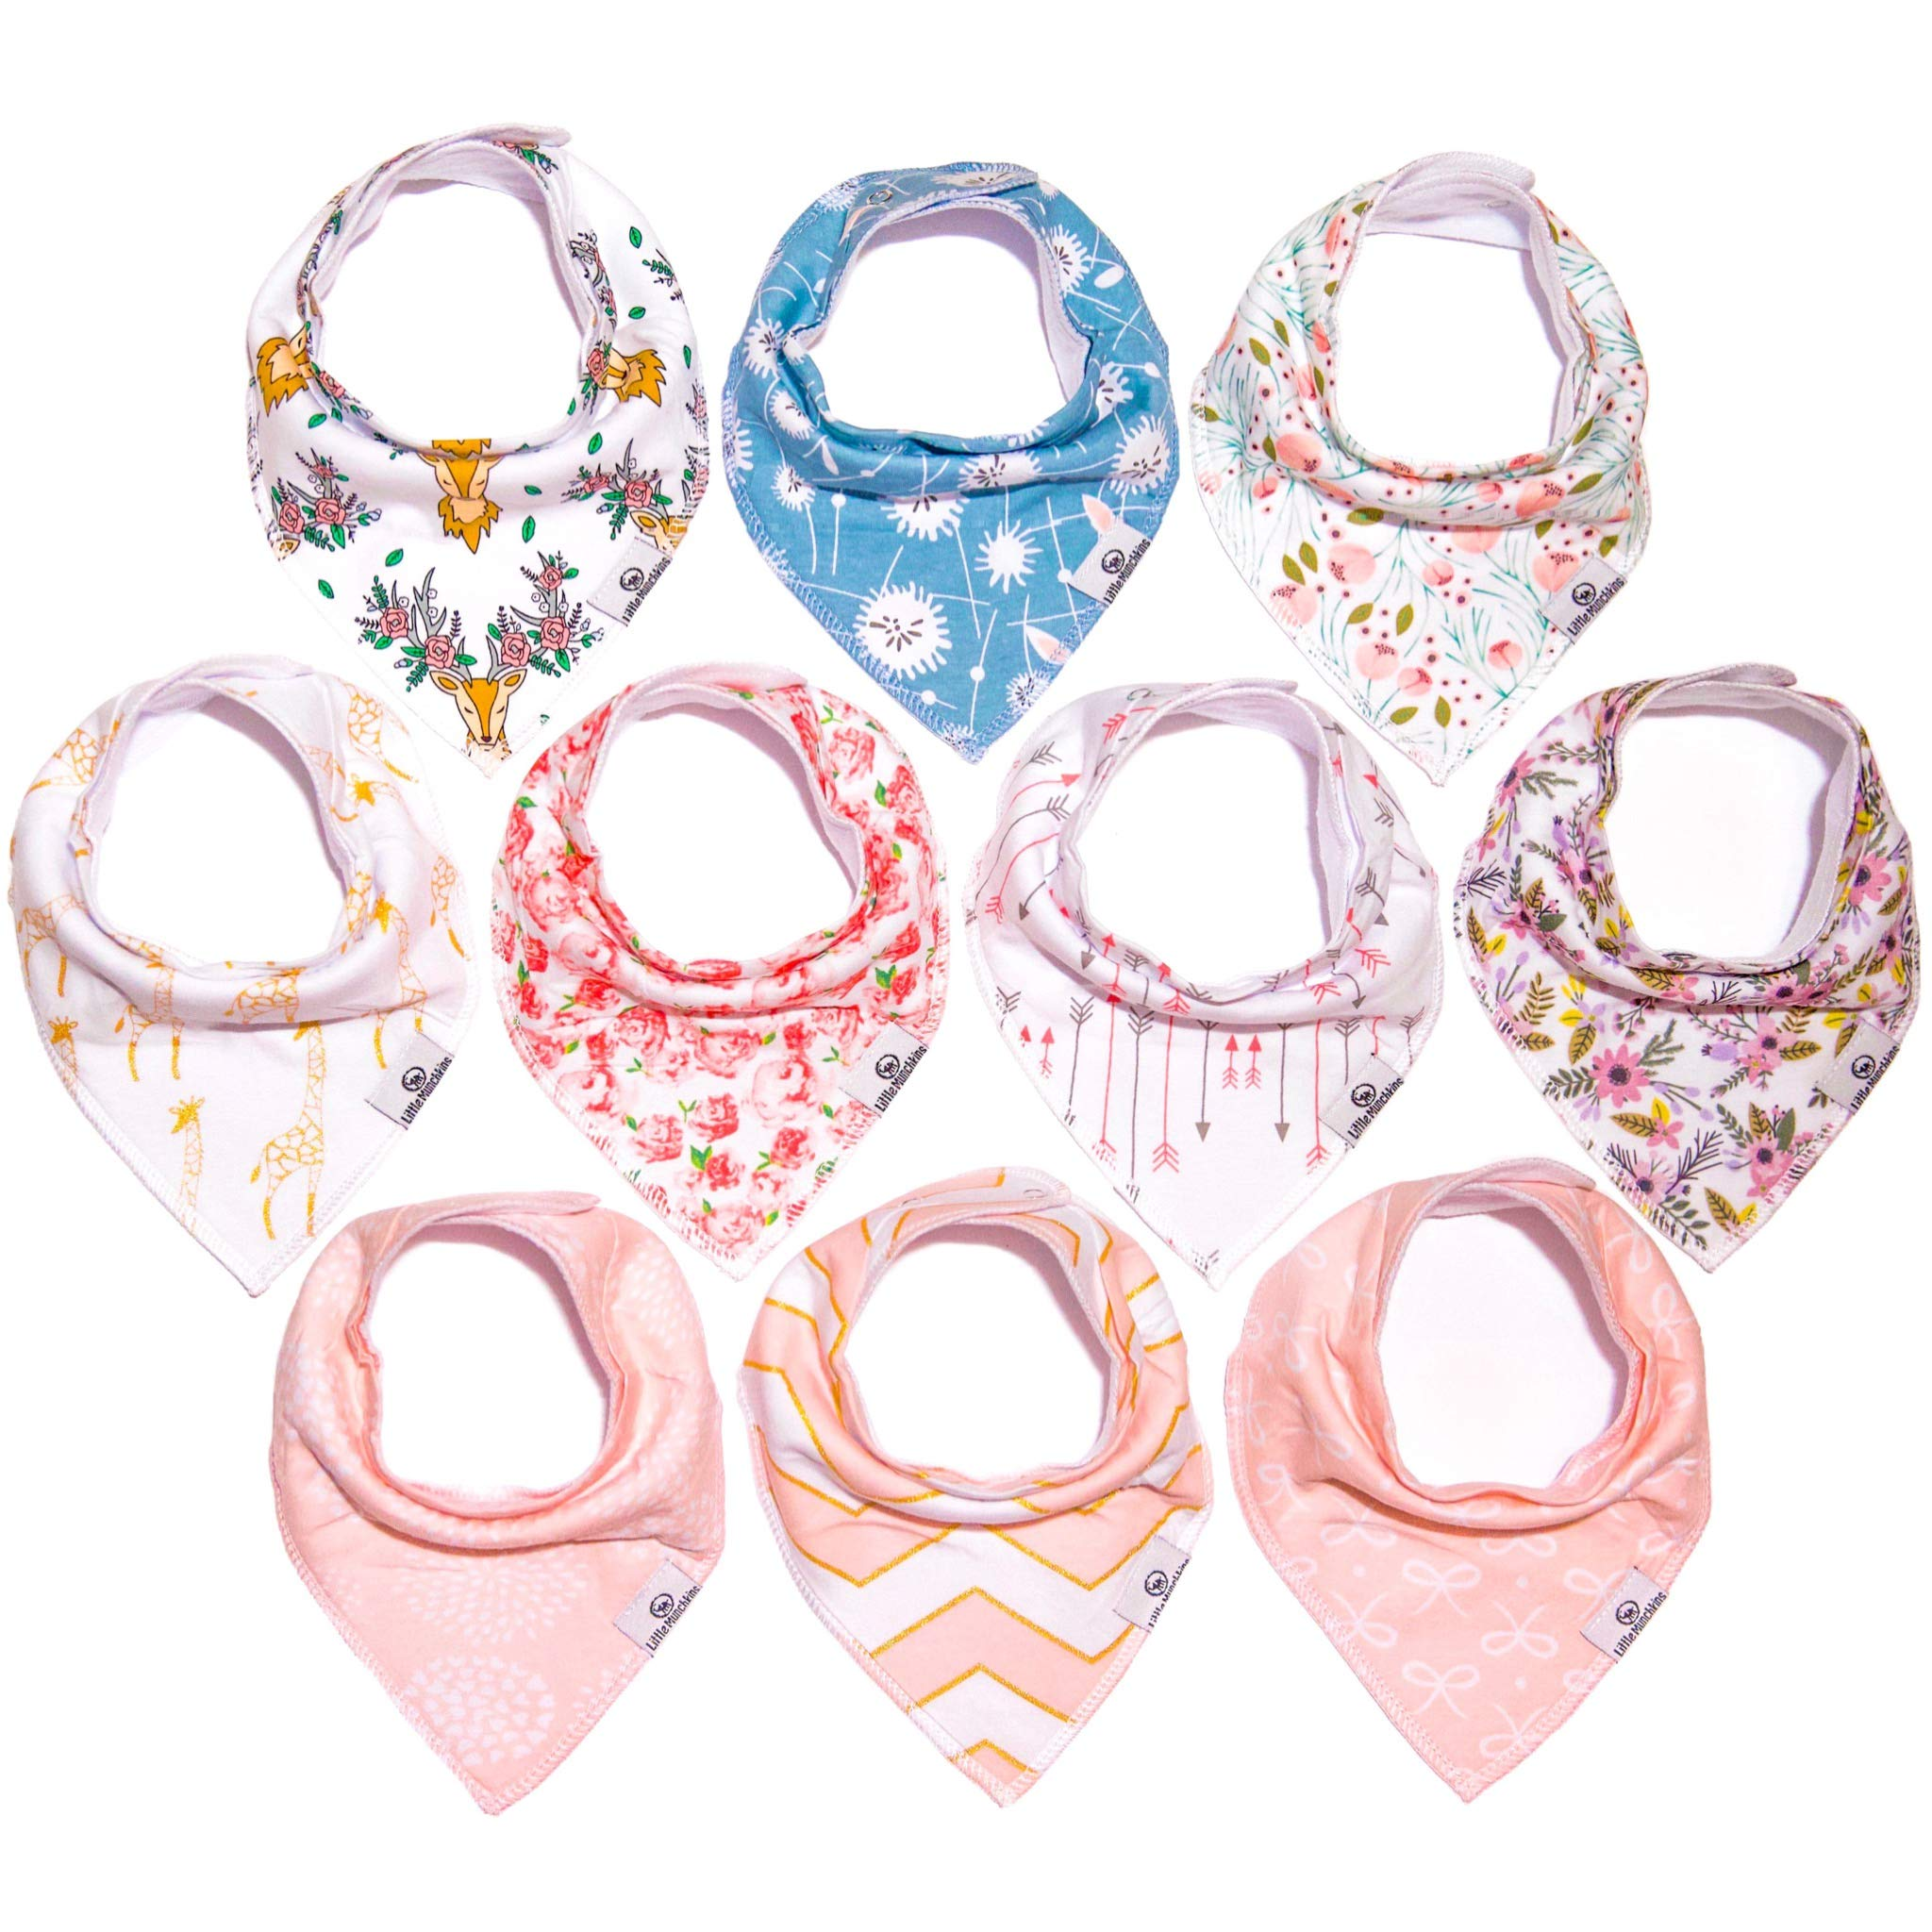 Little Munchkins 10 Pack Baby Bandana Drool Bibs for Girls - Organic Cotton - Absorbent - Soft- Teething Drool Bibs Set by Desi's Trendy Little Munchkins